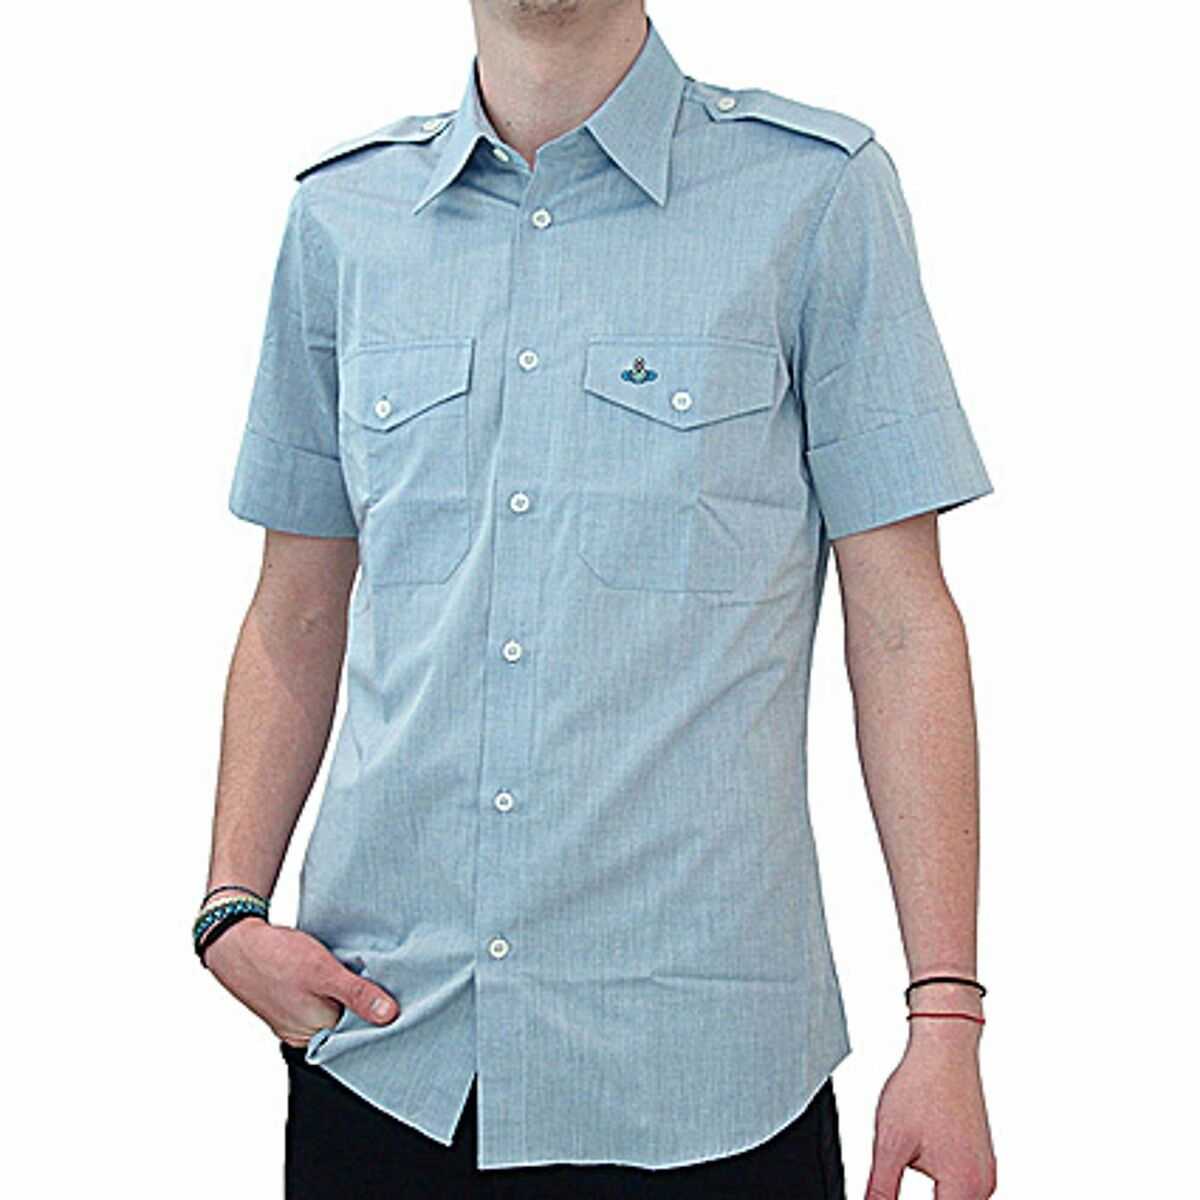 Vivienne Westwood Camicia a maniche corte. sleeve short shirt SIZE 44IT